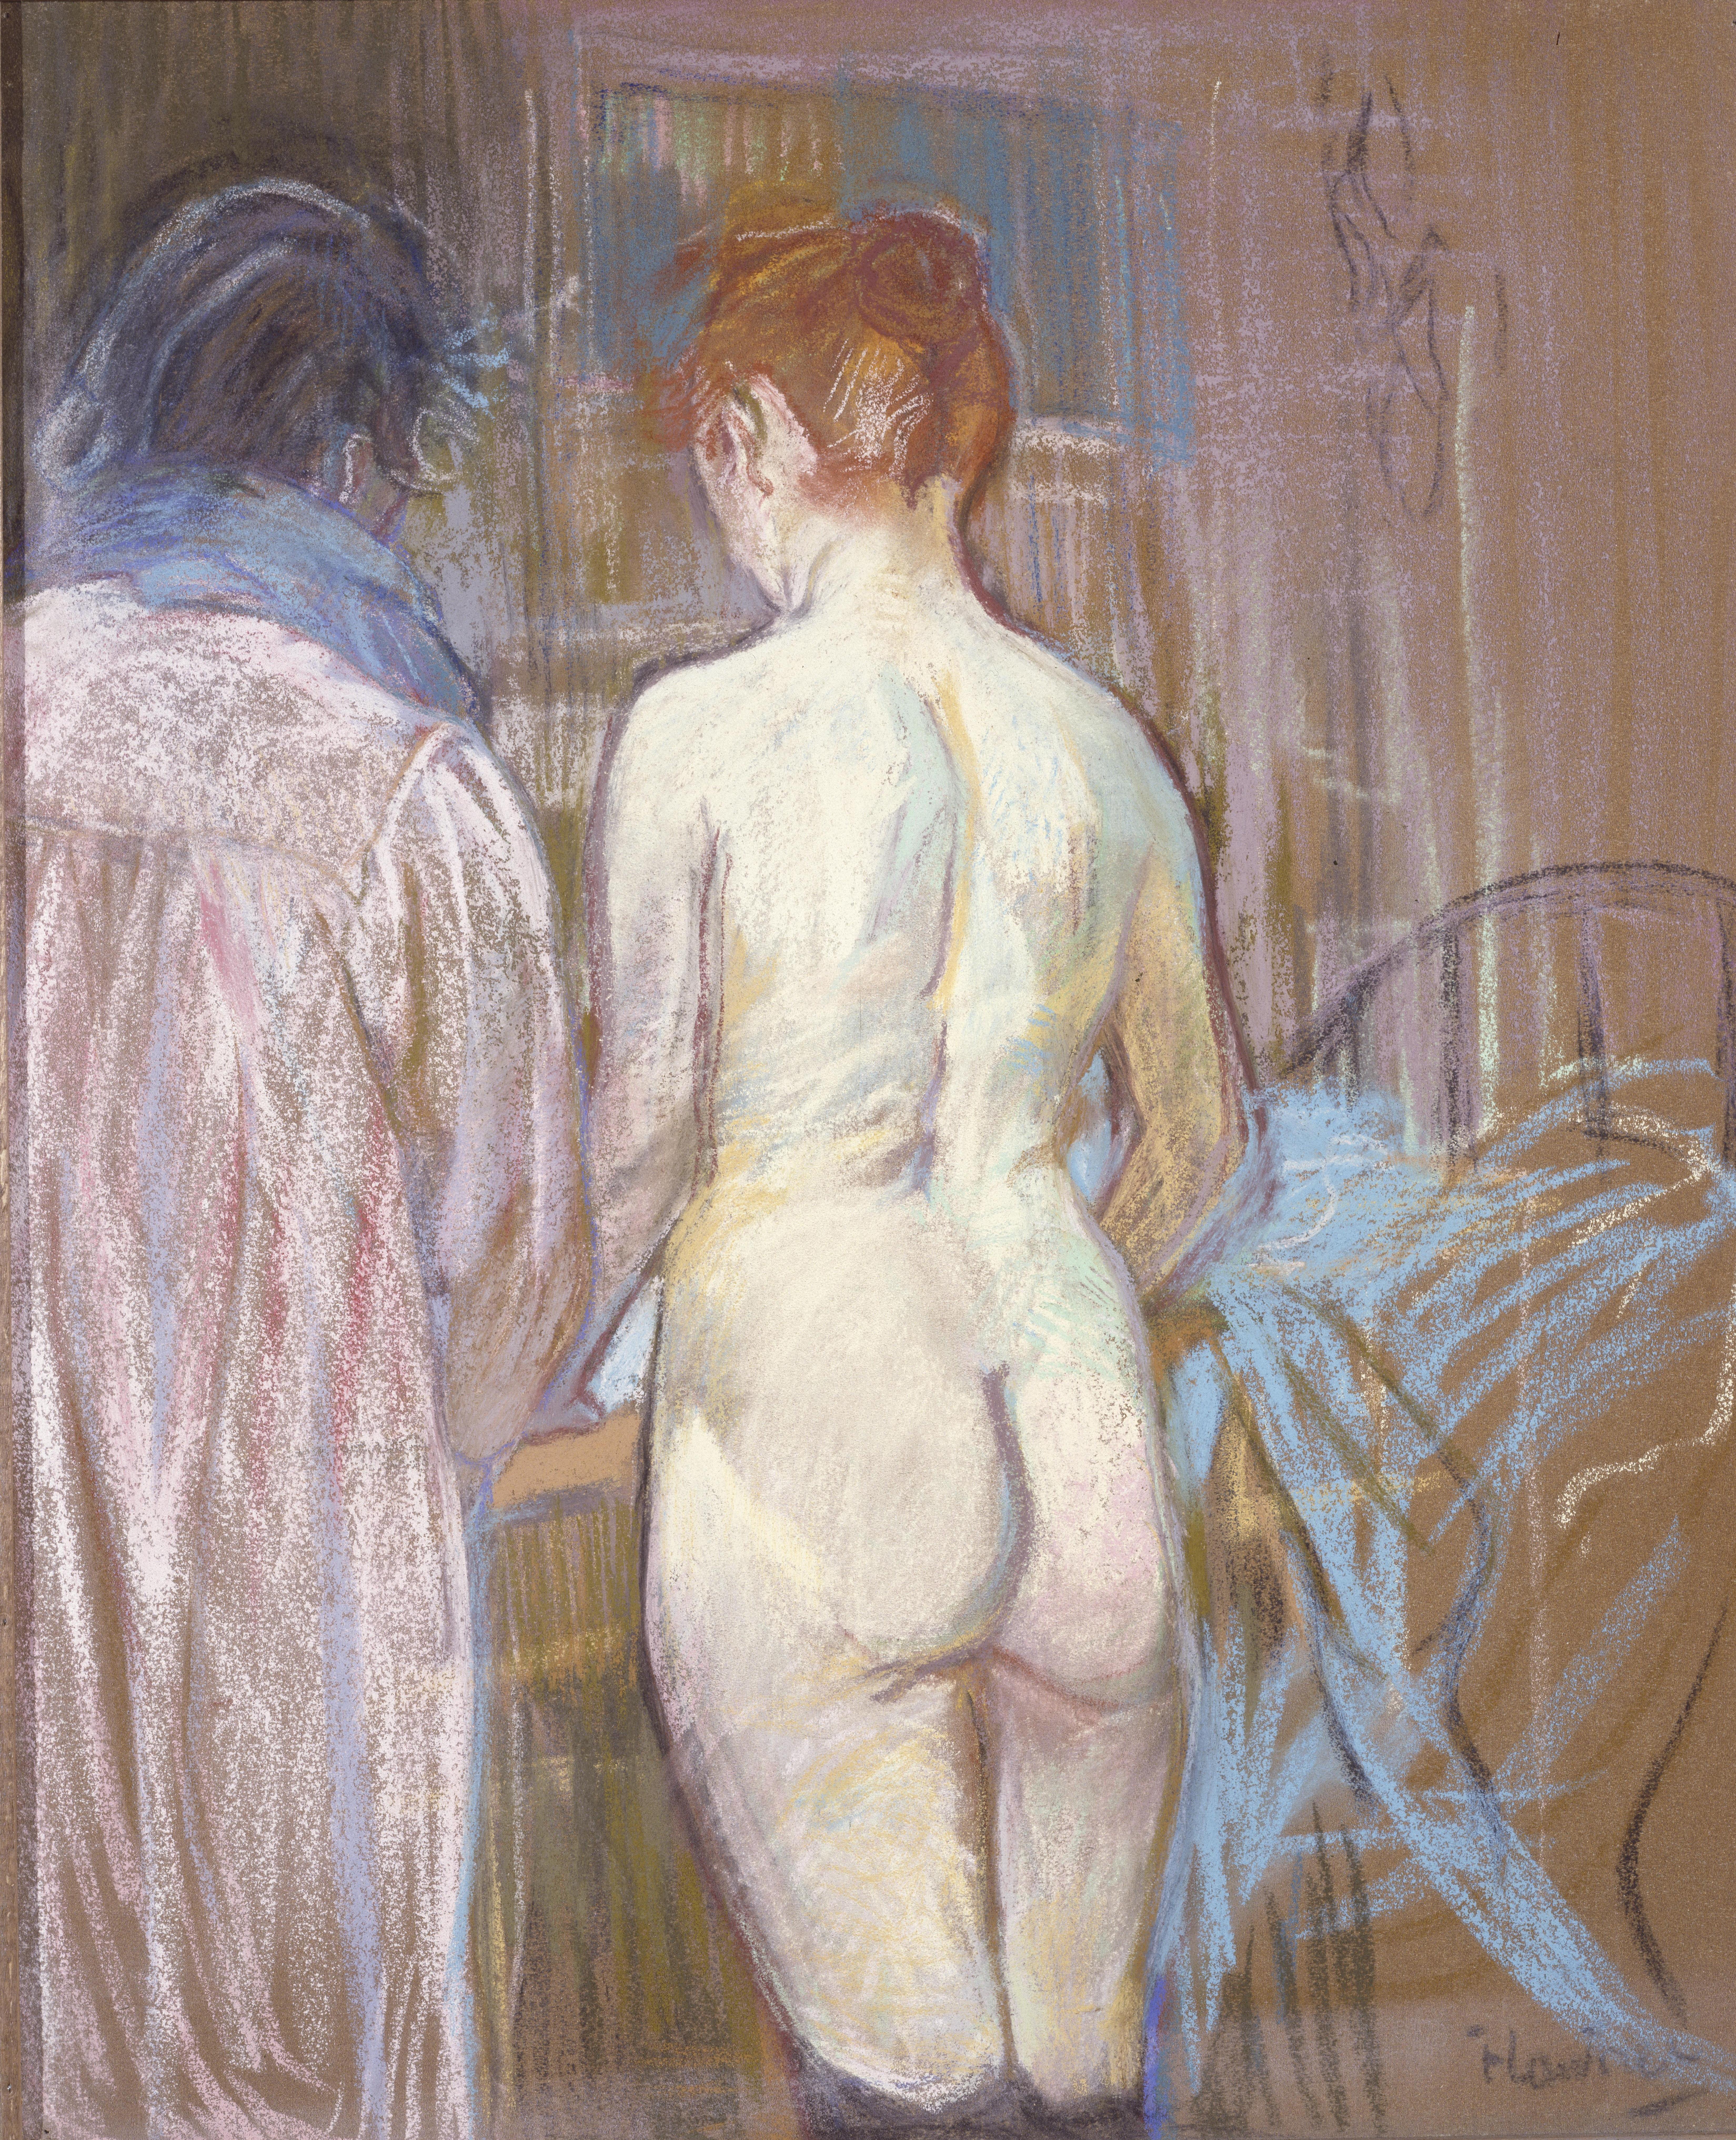 File:Toulouse-Lautrec Prostitutes DMA.jpg